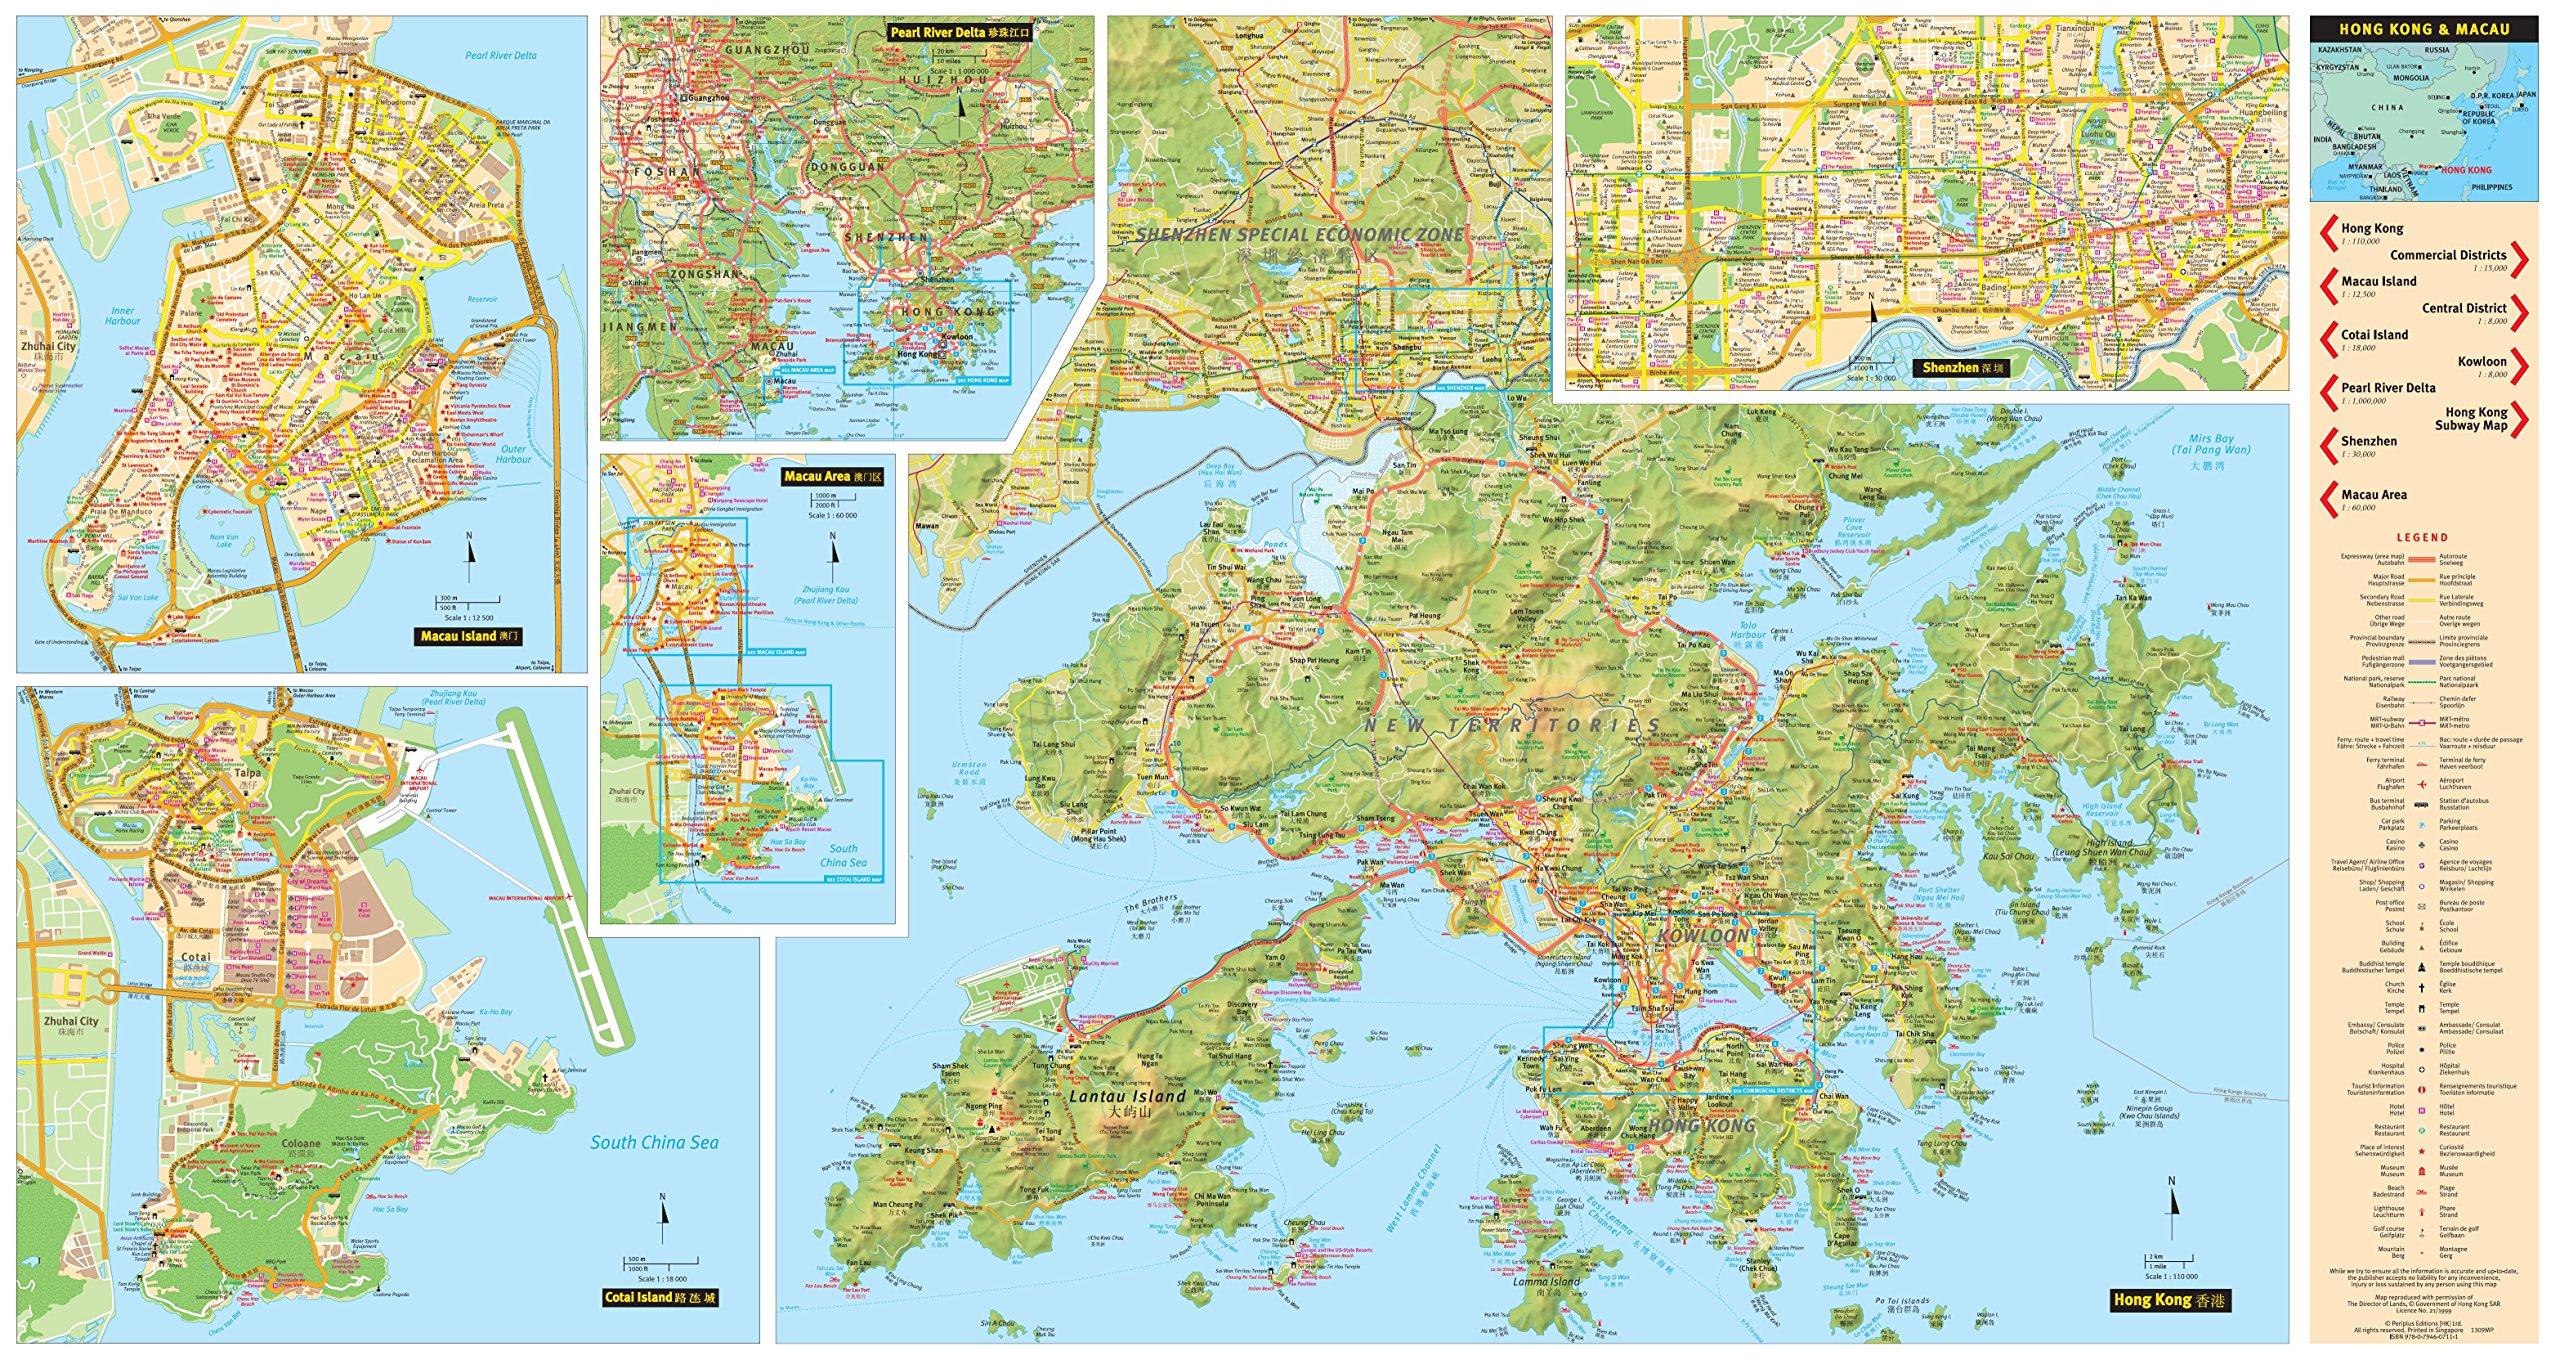 Hong kong macau travel map sixth edition tuttle travel maps hong kong macau travel map sixth edition tuttle travel maps periplus editions 9780794607111 amazon books gumiabroncs Images